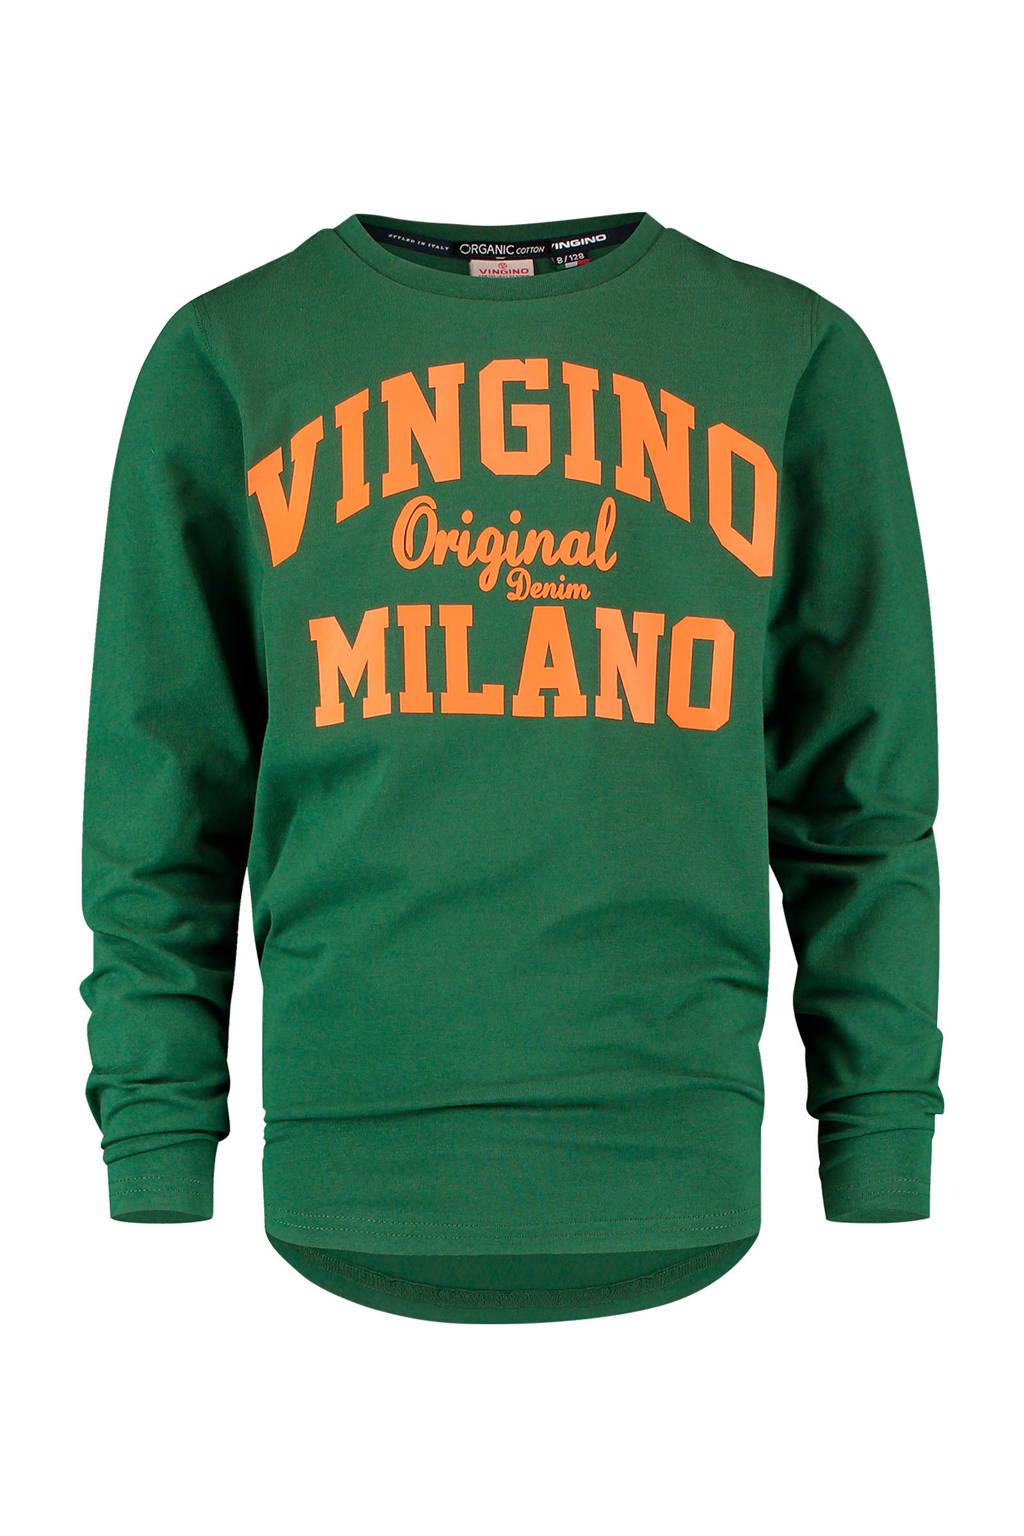 Vingino Essentials longsleeve T-shirt met logo donkergroen/oranje, Donkergroen/oranje